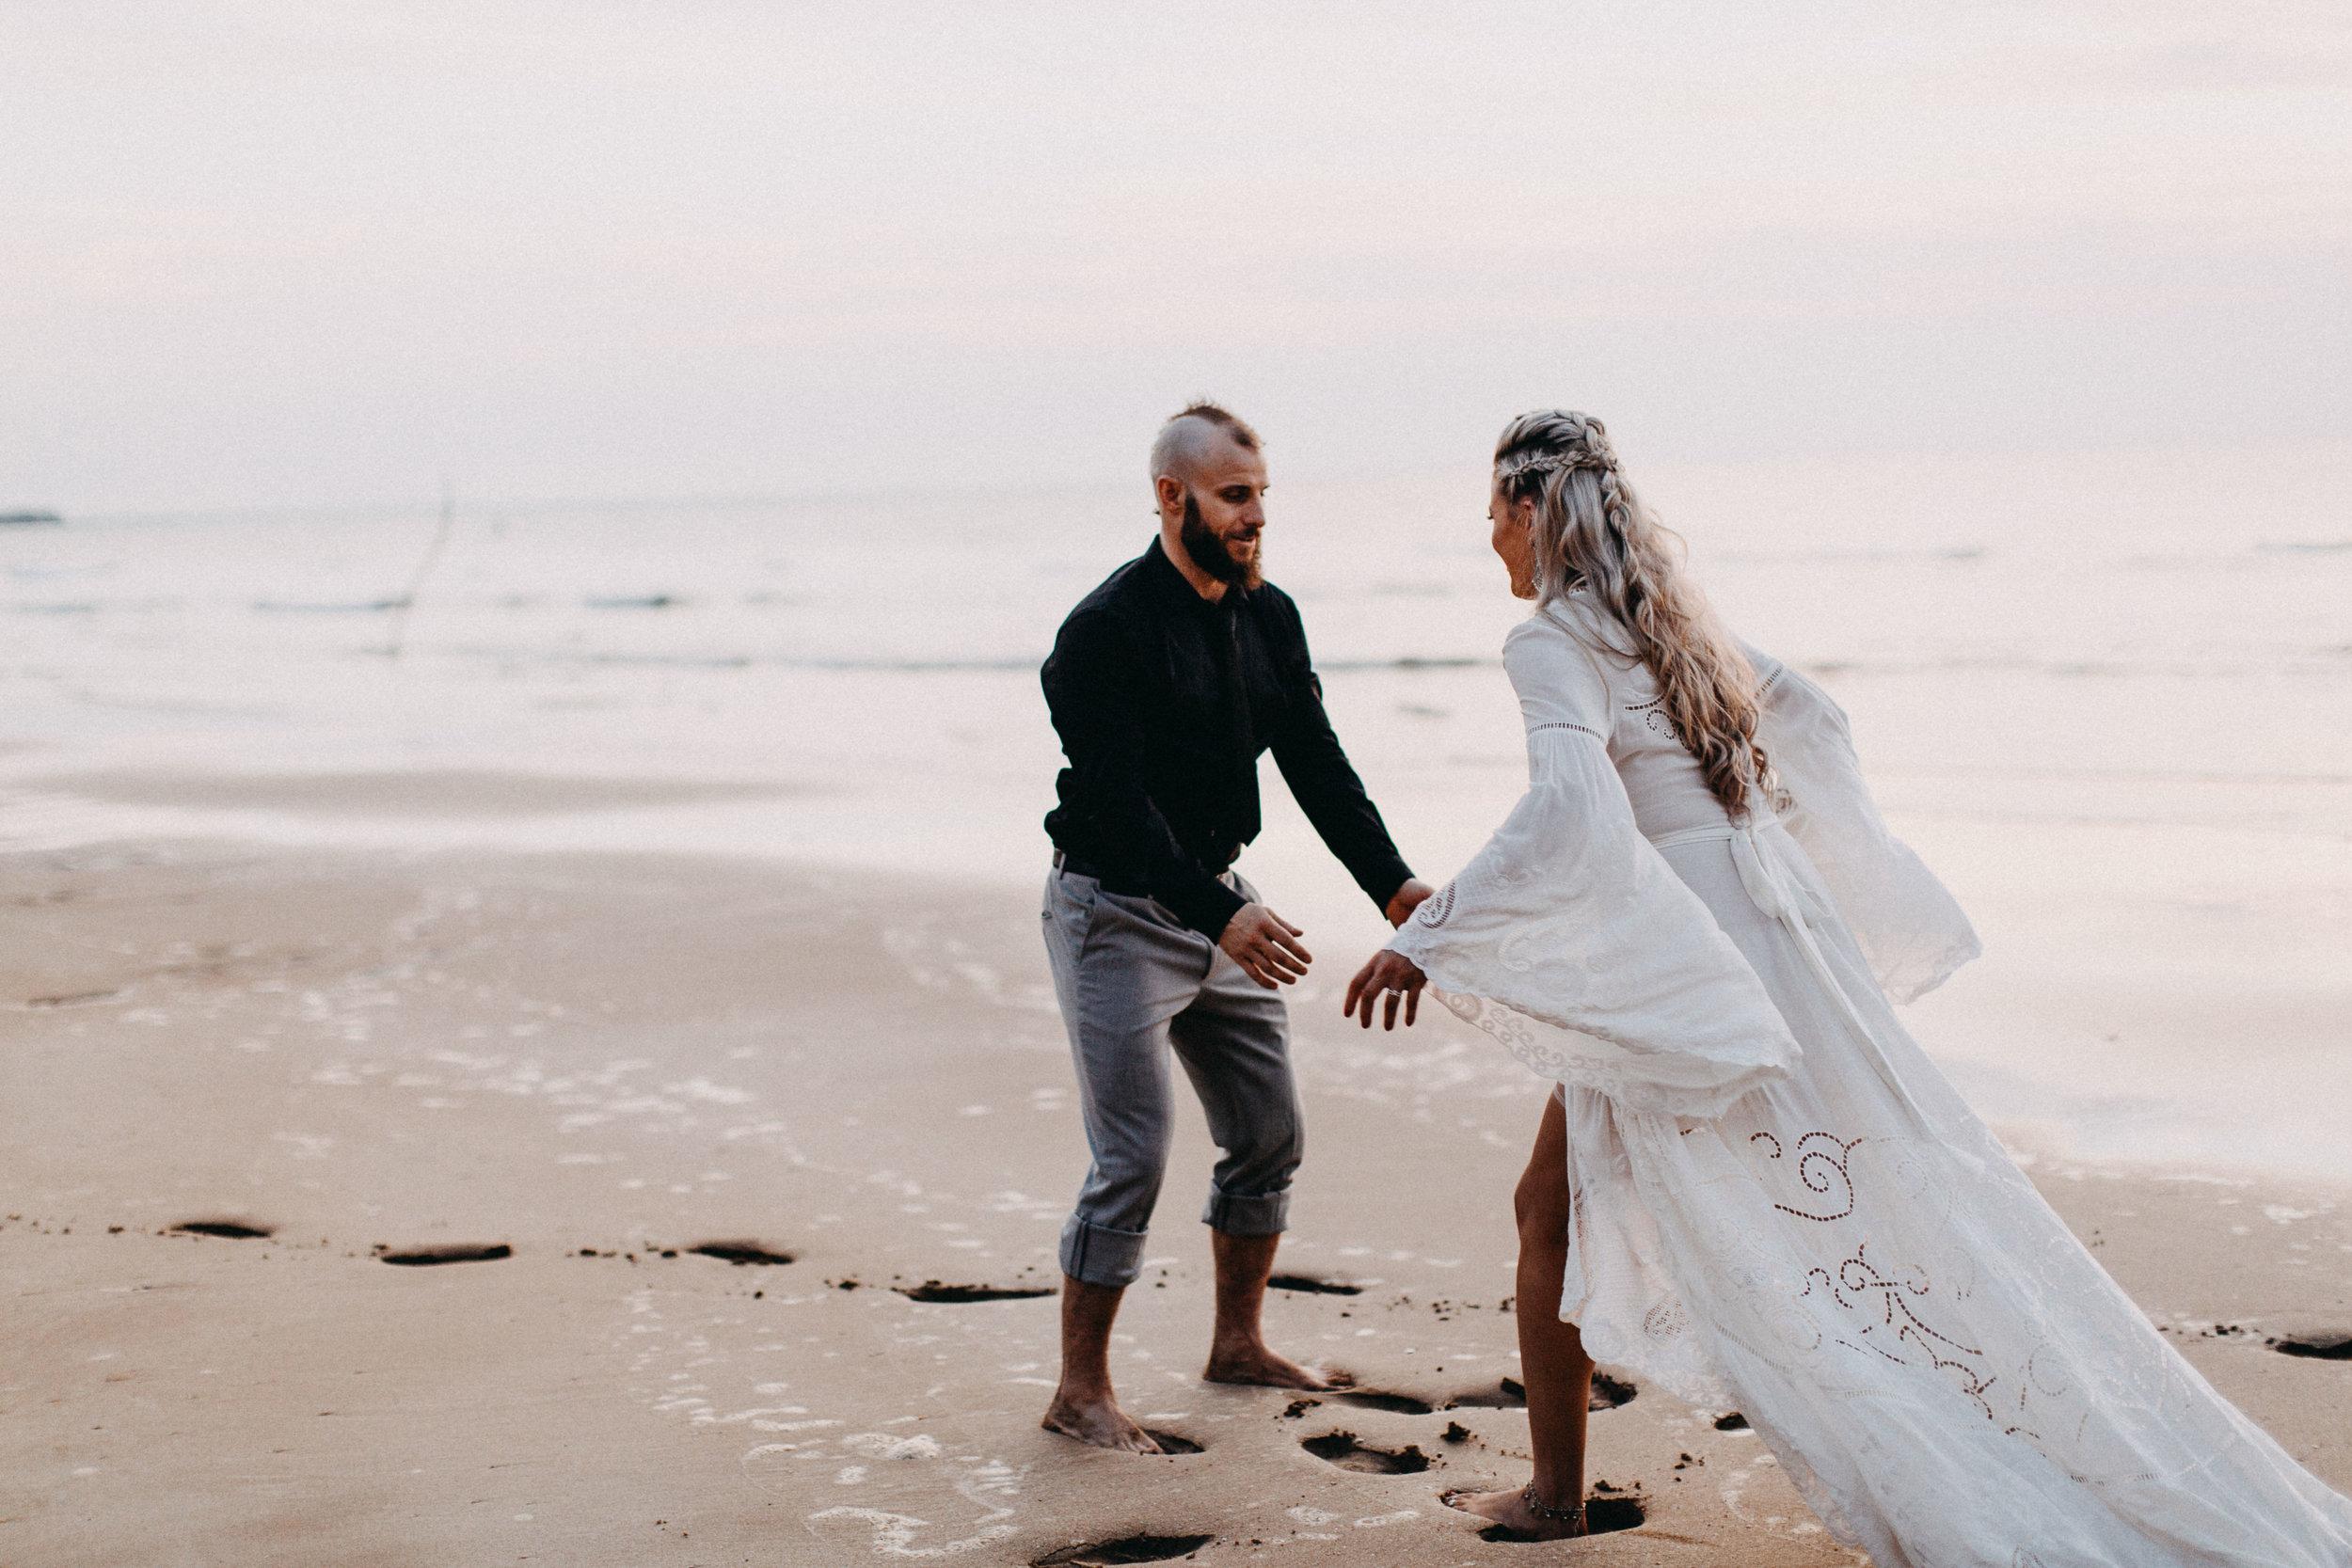 darwin-elopement-wedding-beach-camden-photography-www.emilyobrienphotography.net-94.jpg